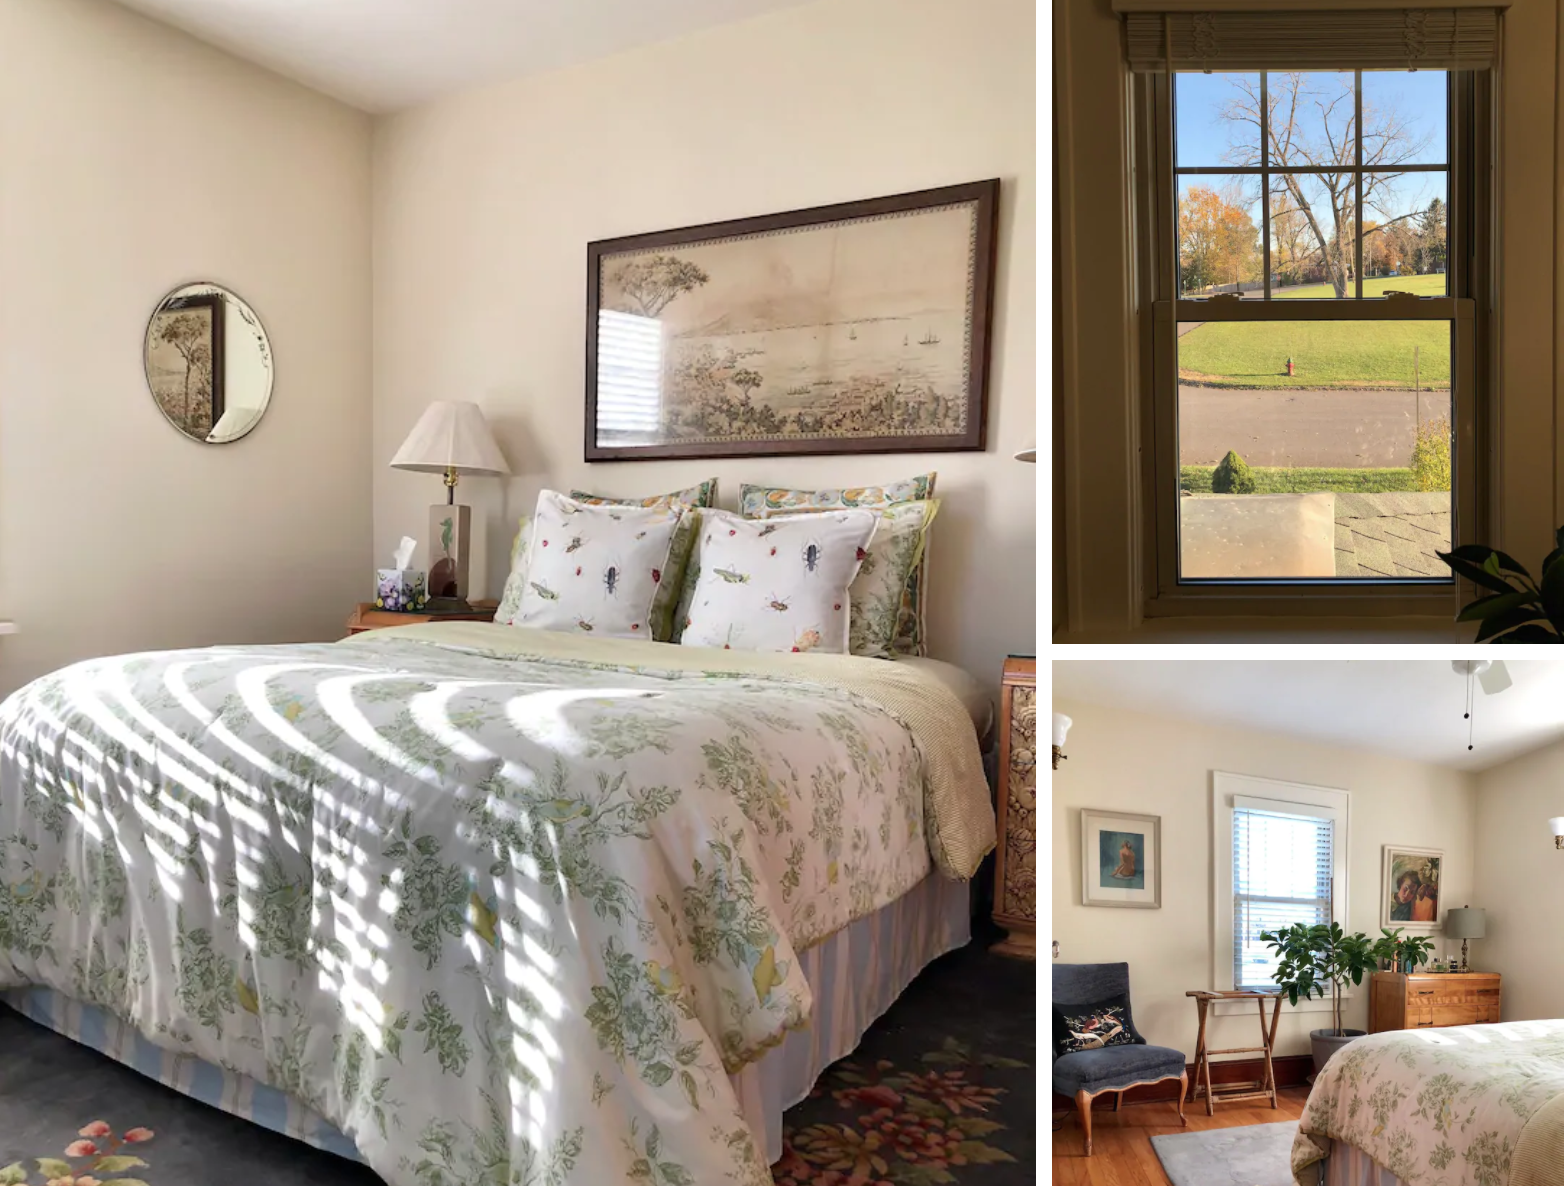 Charming Vintage Sears Home hudson ny airbnb